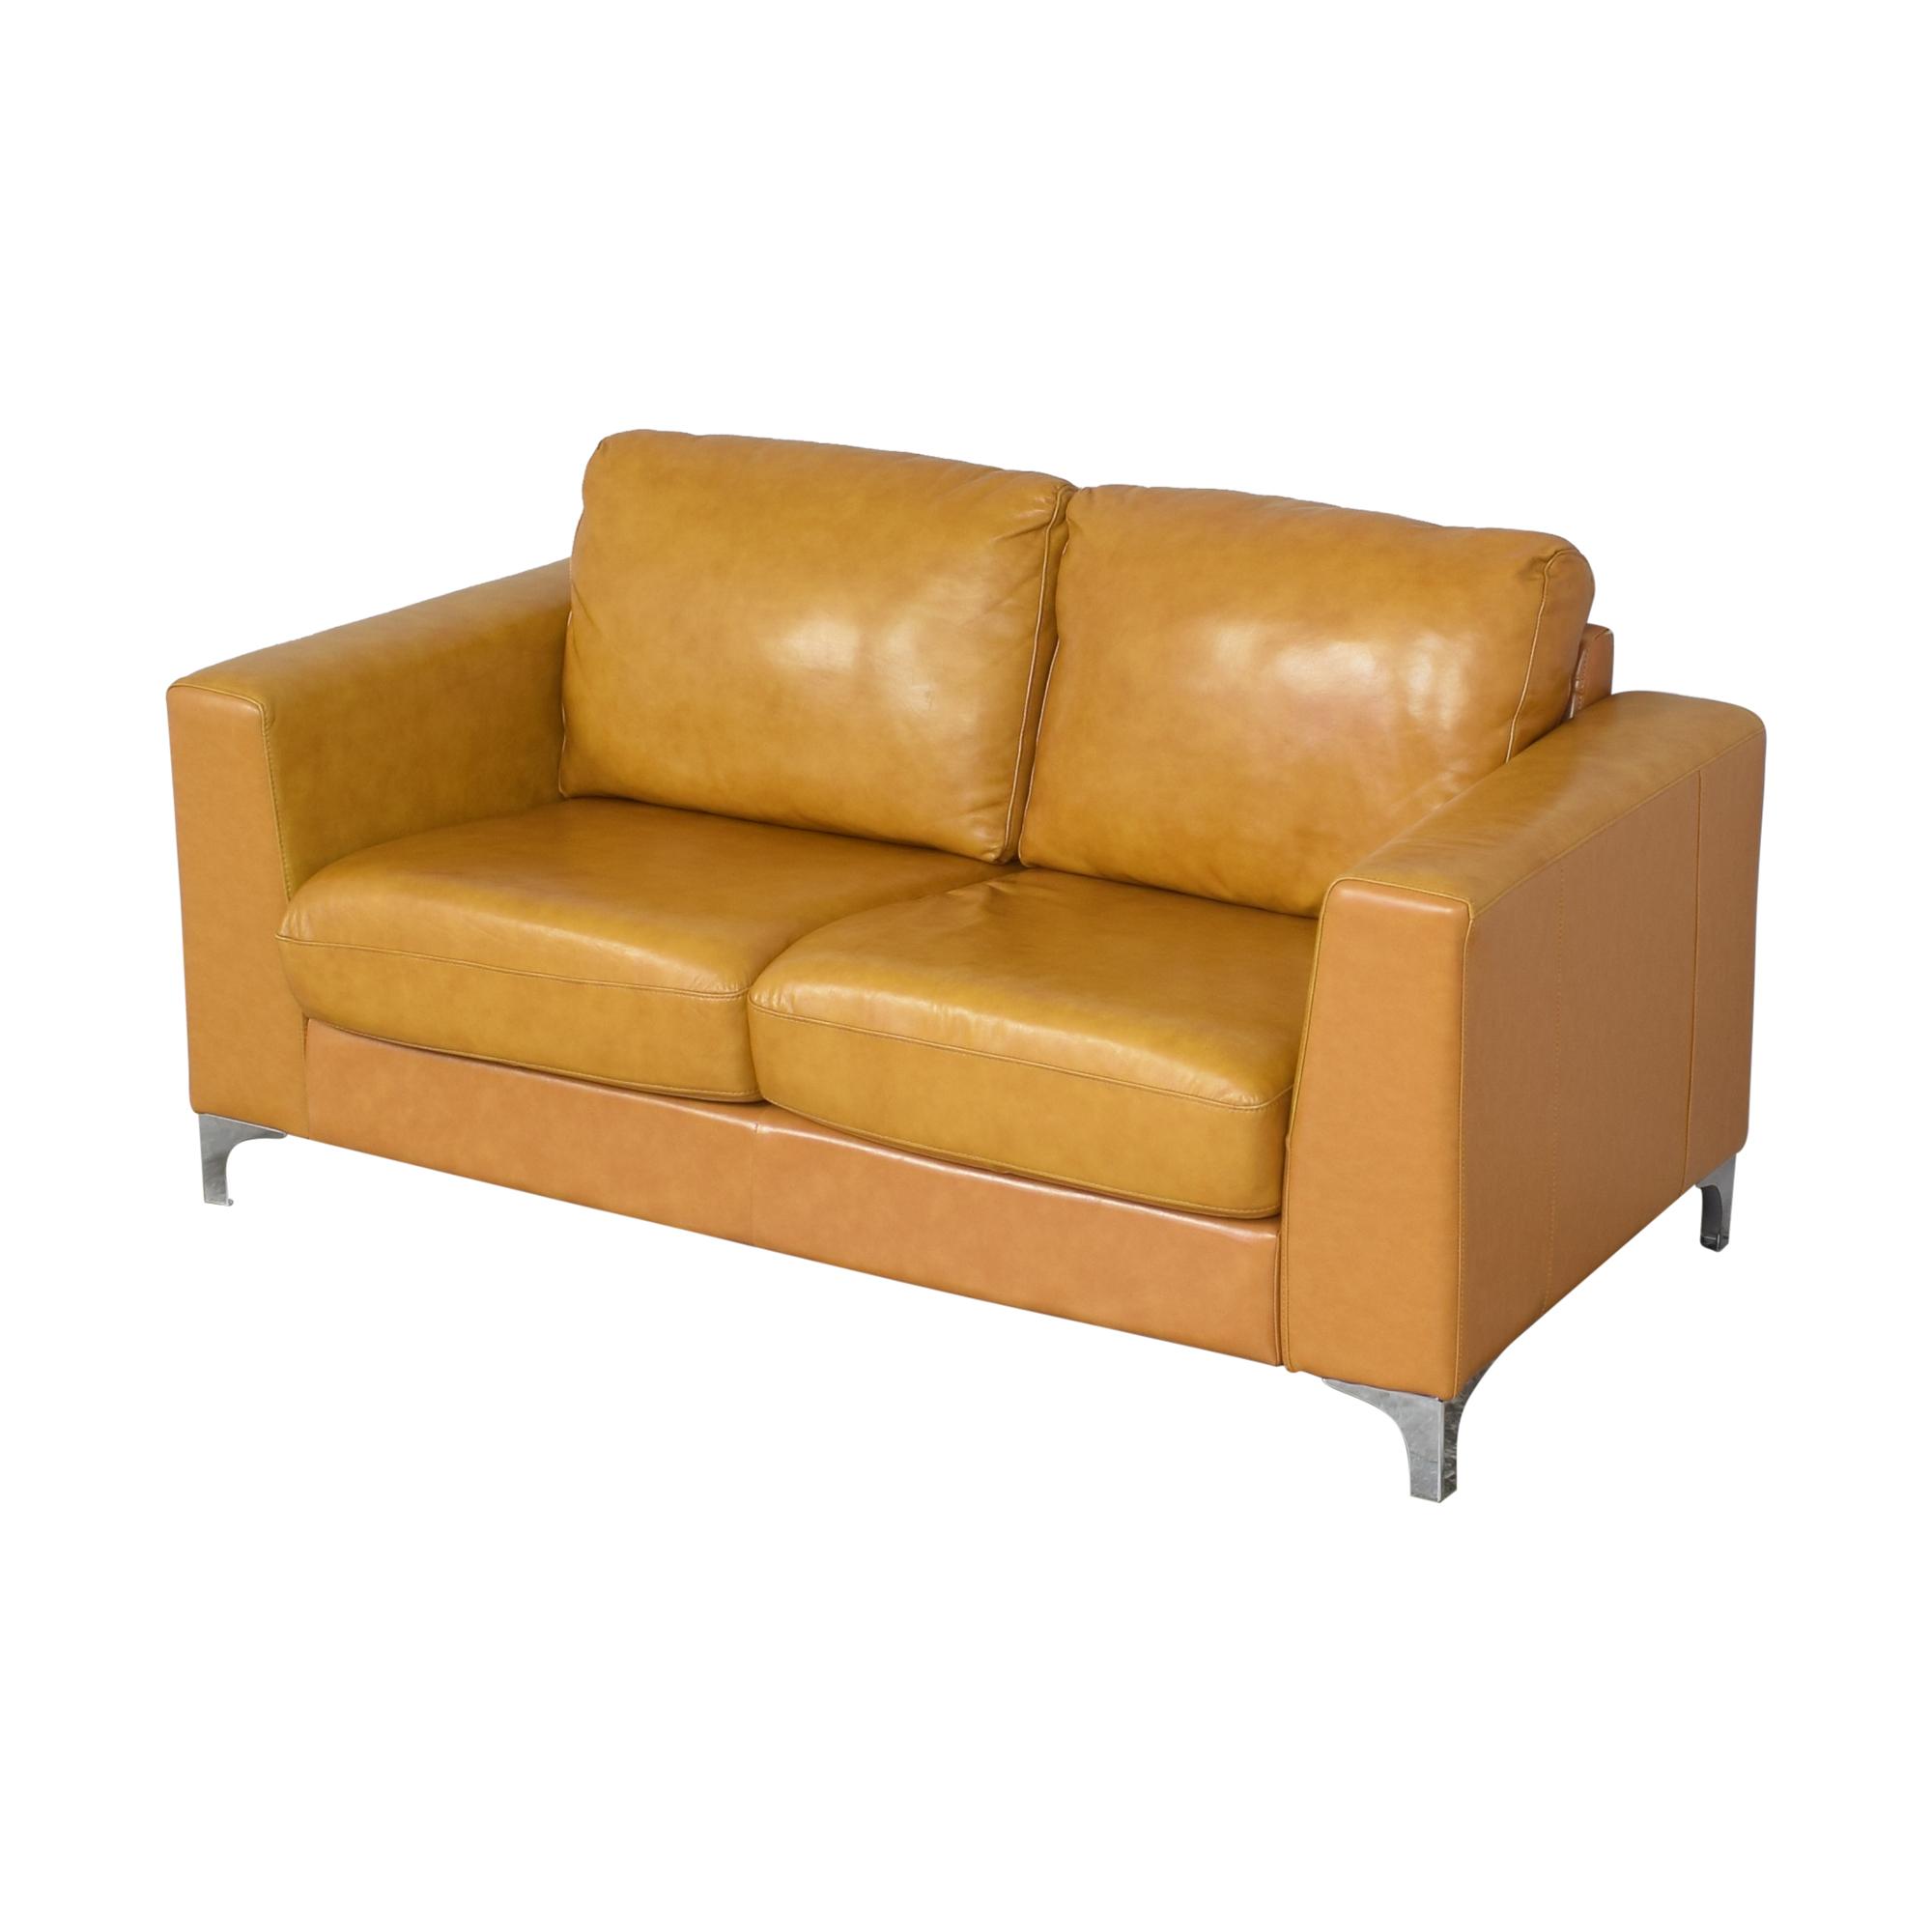 buy Wayfair Wayfair Modern Two Cushion Sofa online